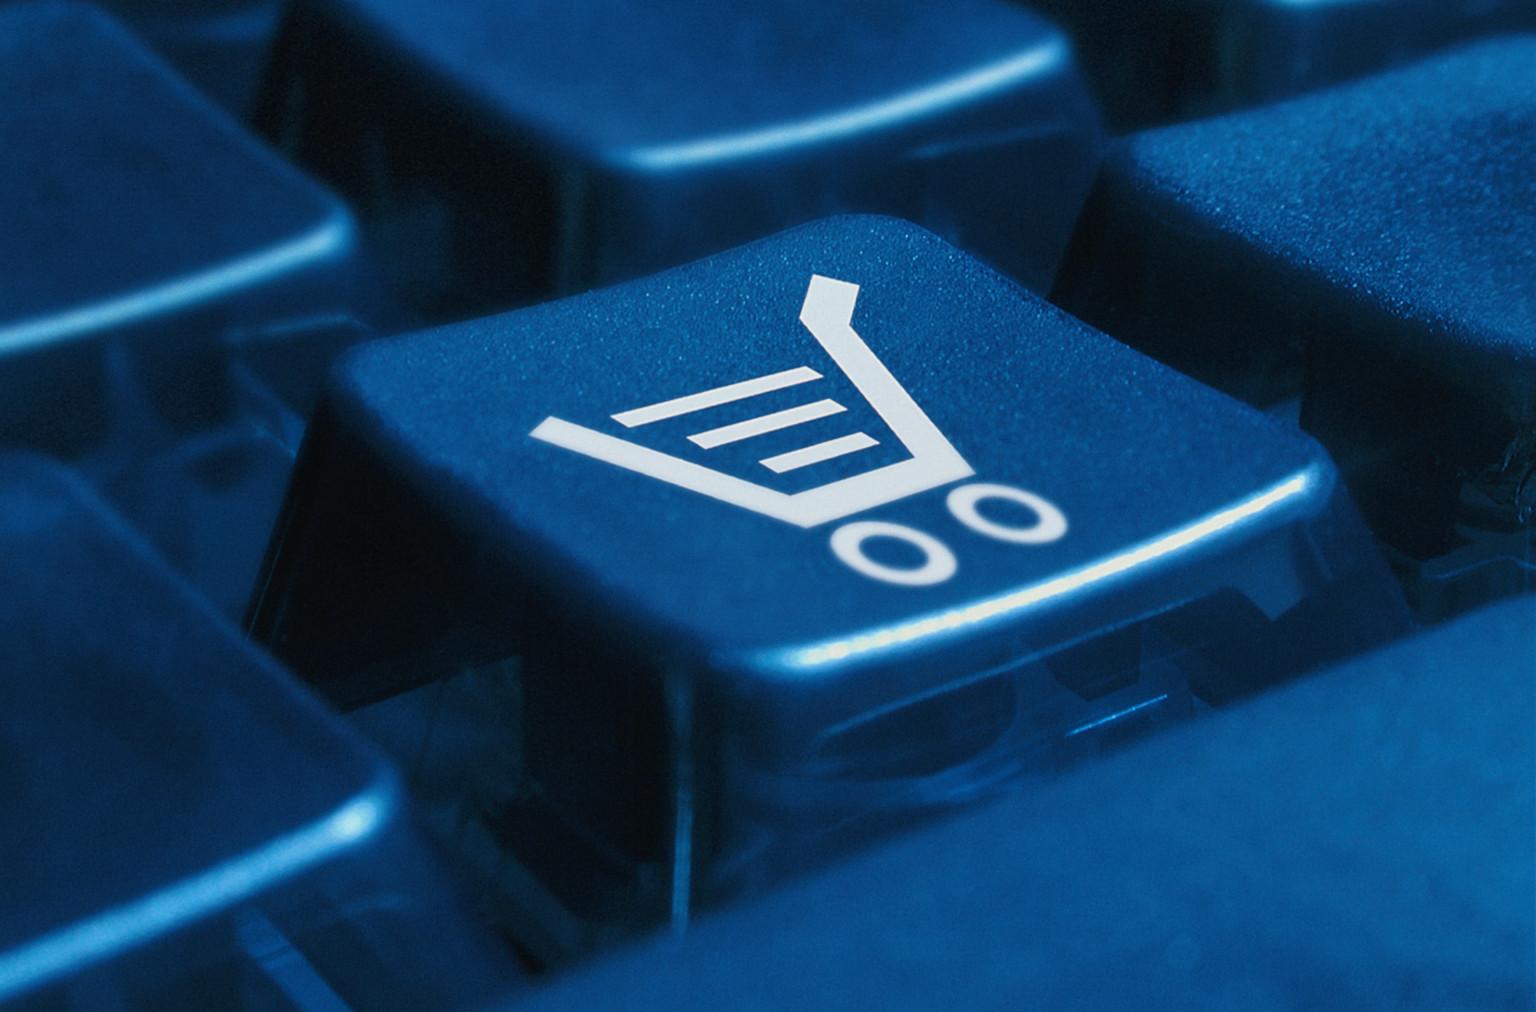 Formas de divulgar seu e-commerce